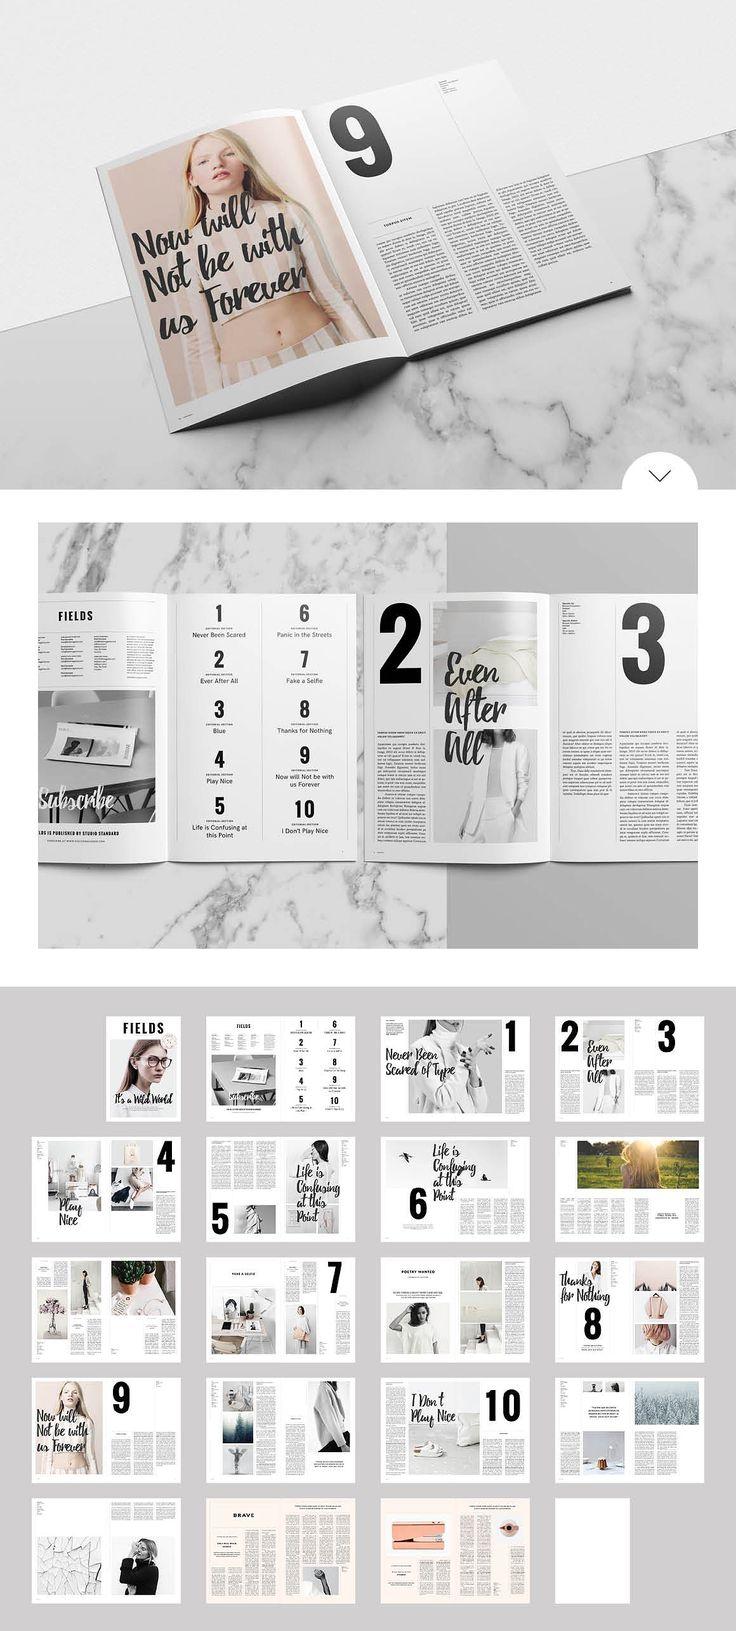 Best 25+ Standard resume format ideas on Pinterest | Standard cv ...